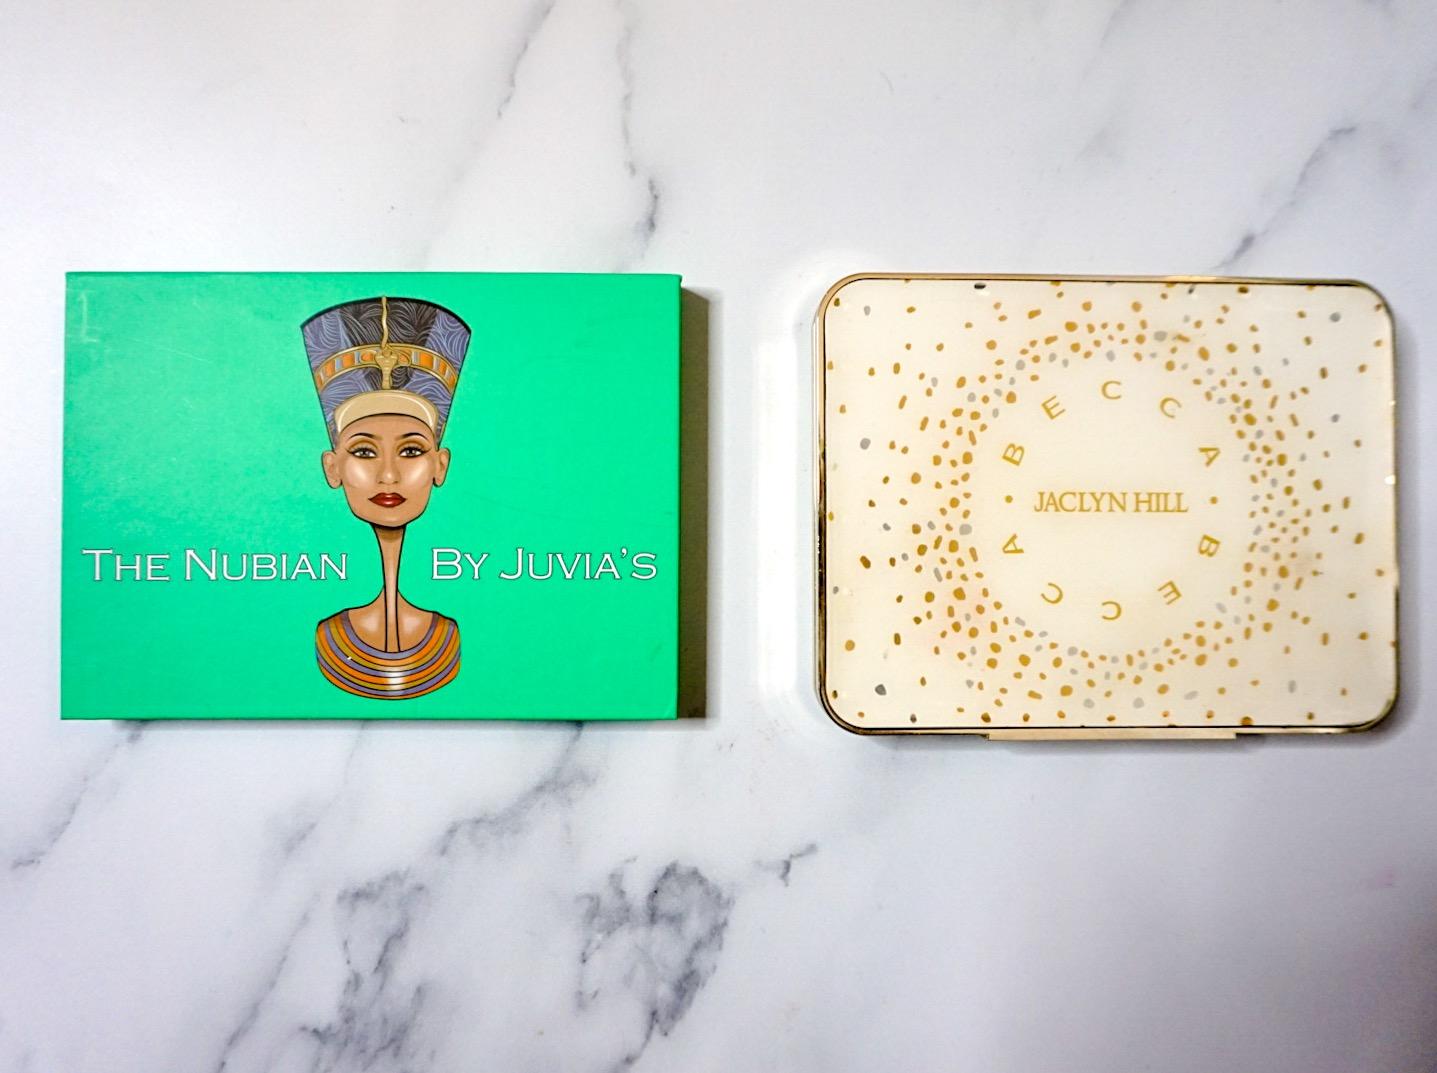 Best Pigmentation: Juvia's Place Nubian Eyeshadow Palette & BECCA x Jaclyn Hill Face Palette